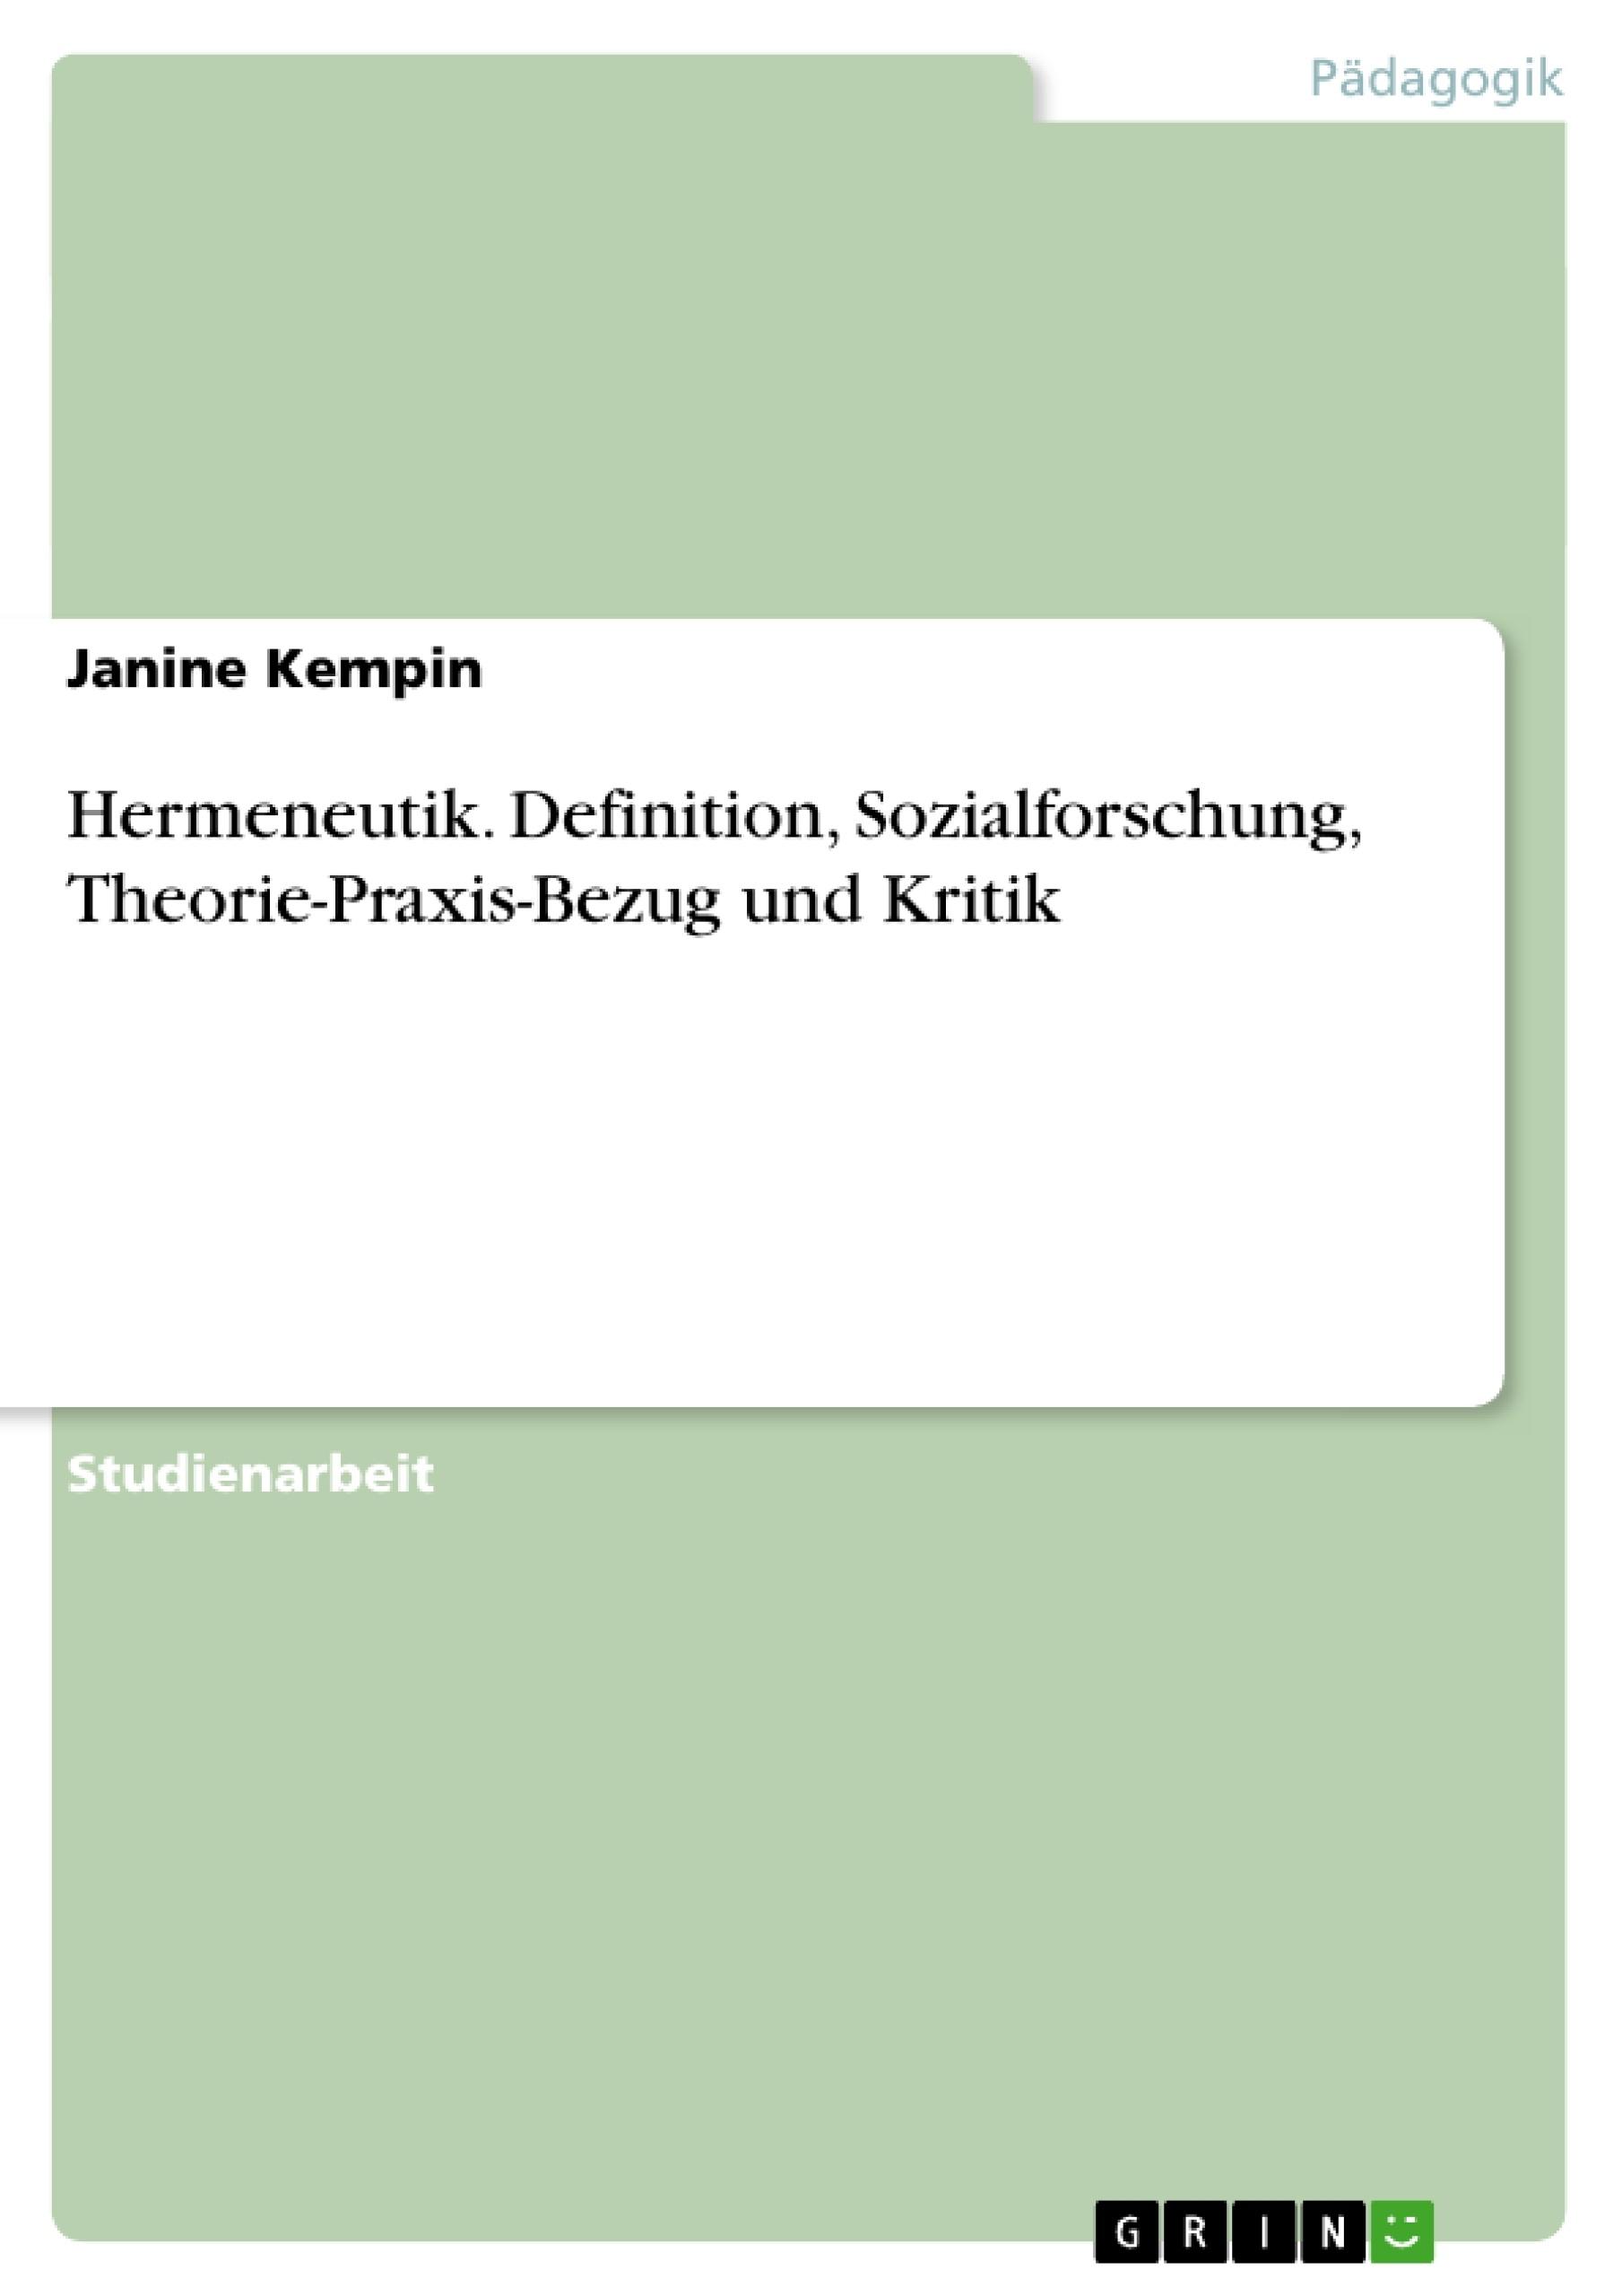 Titel: Hermeneutik. Definition, Sozialforschung, Theorie-Praxis-Bezug und Kritik